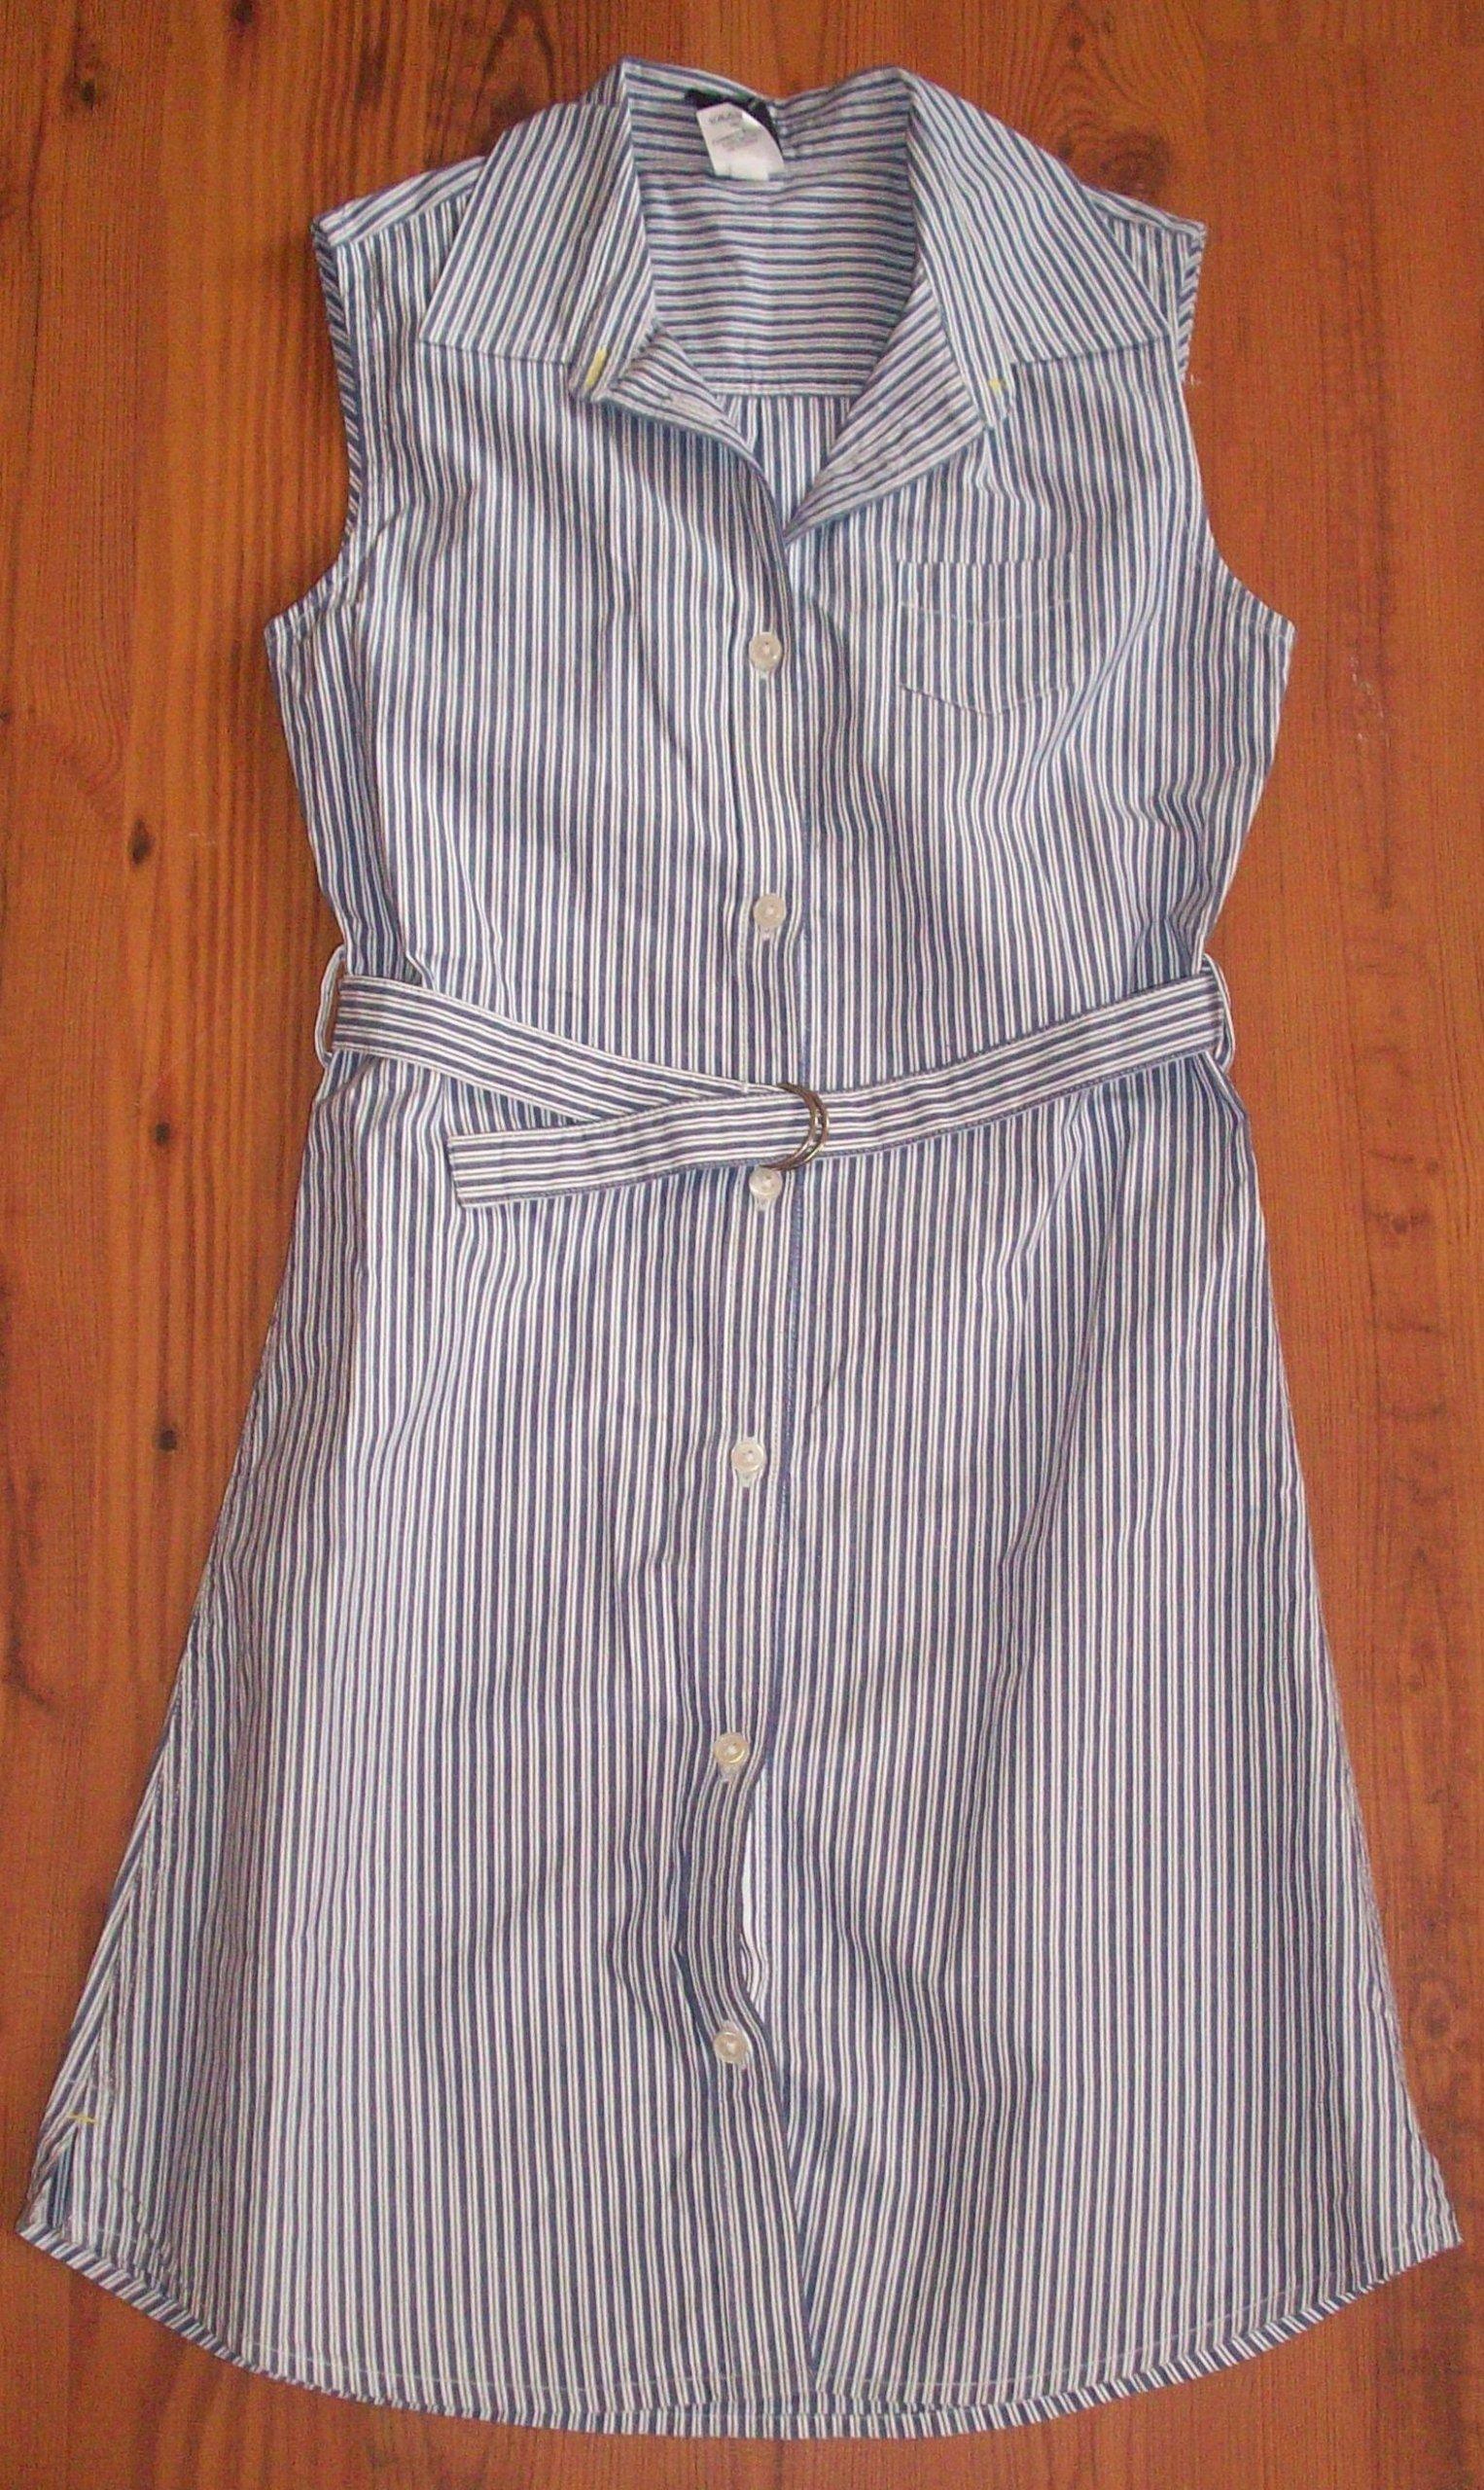 Sukienka pasy GAP 7-8 lat niebieska biała